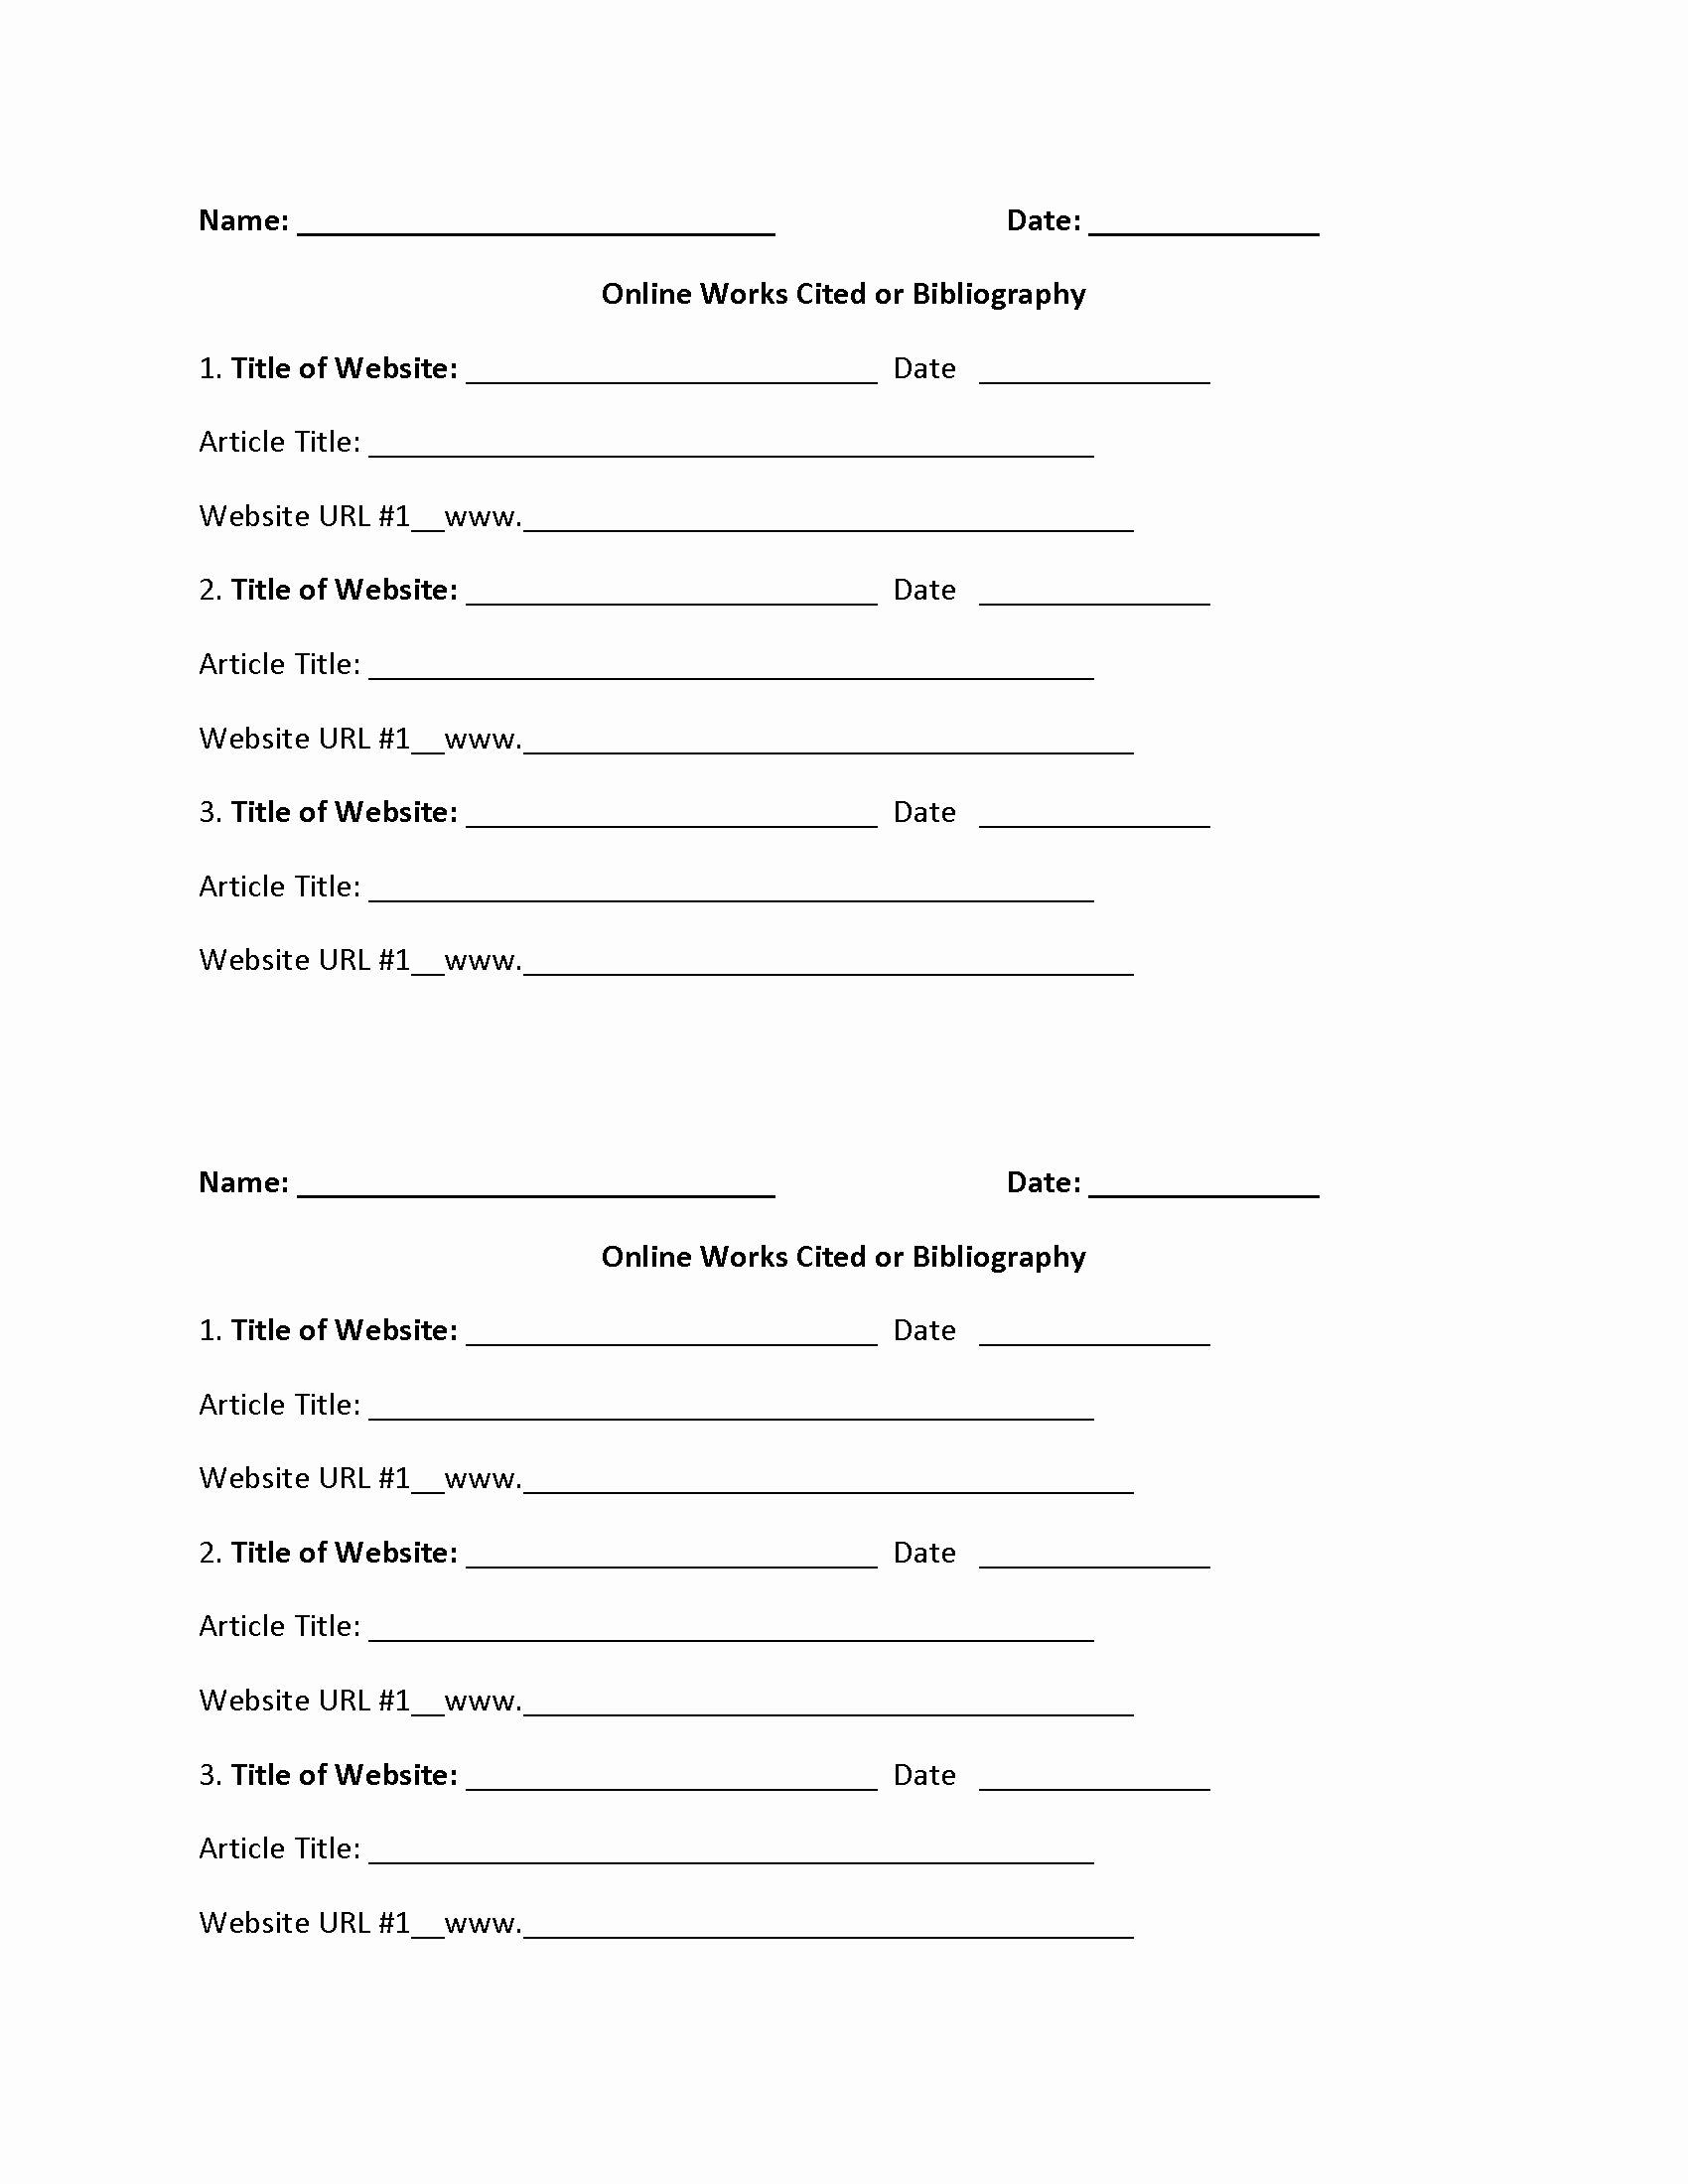 Bibliography Practice Worksheets Best Of Easily 20 Bibliography Practice Worksheets Worksheet